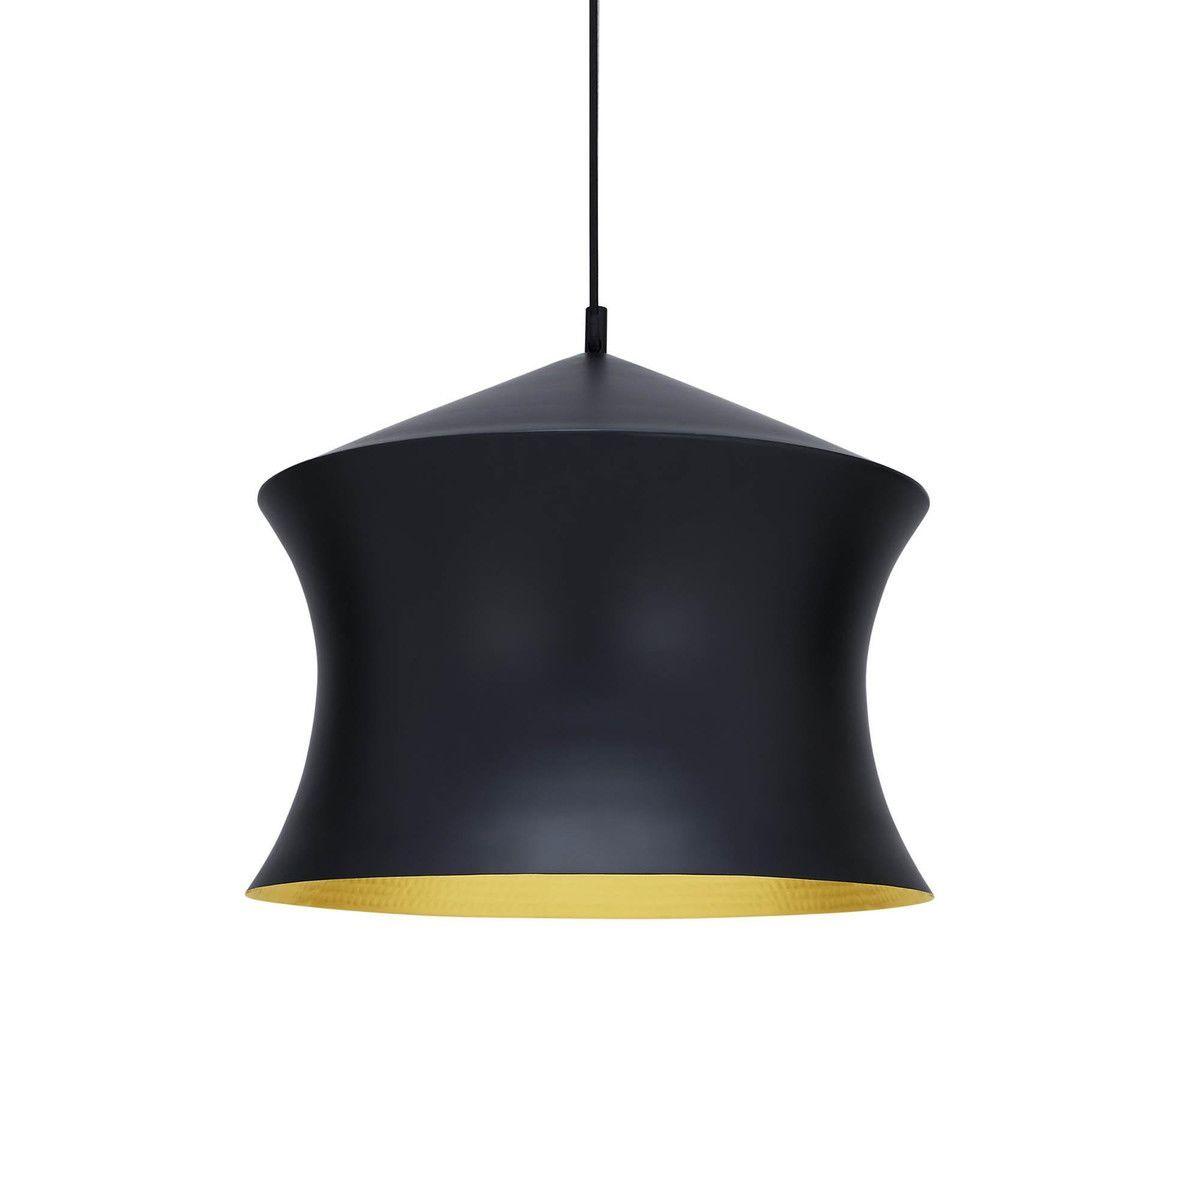 beat waist suspension lamp tom dixon. Black Bedroom Furniture Sets. Home Design Ideas